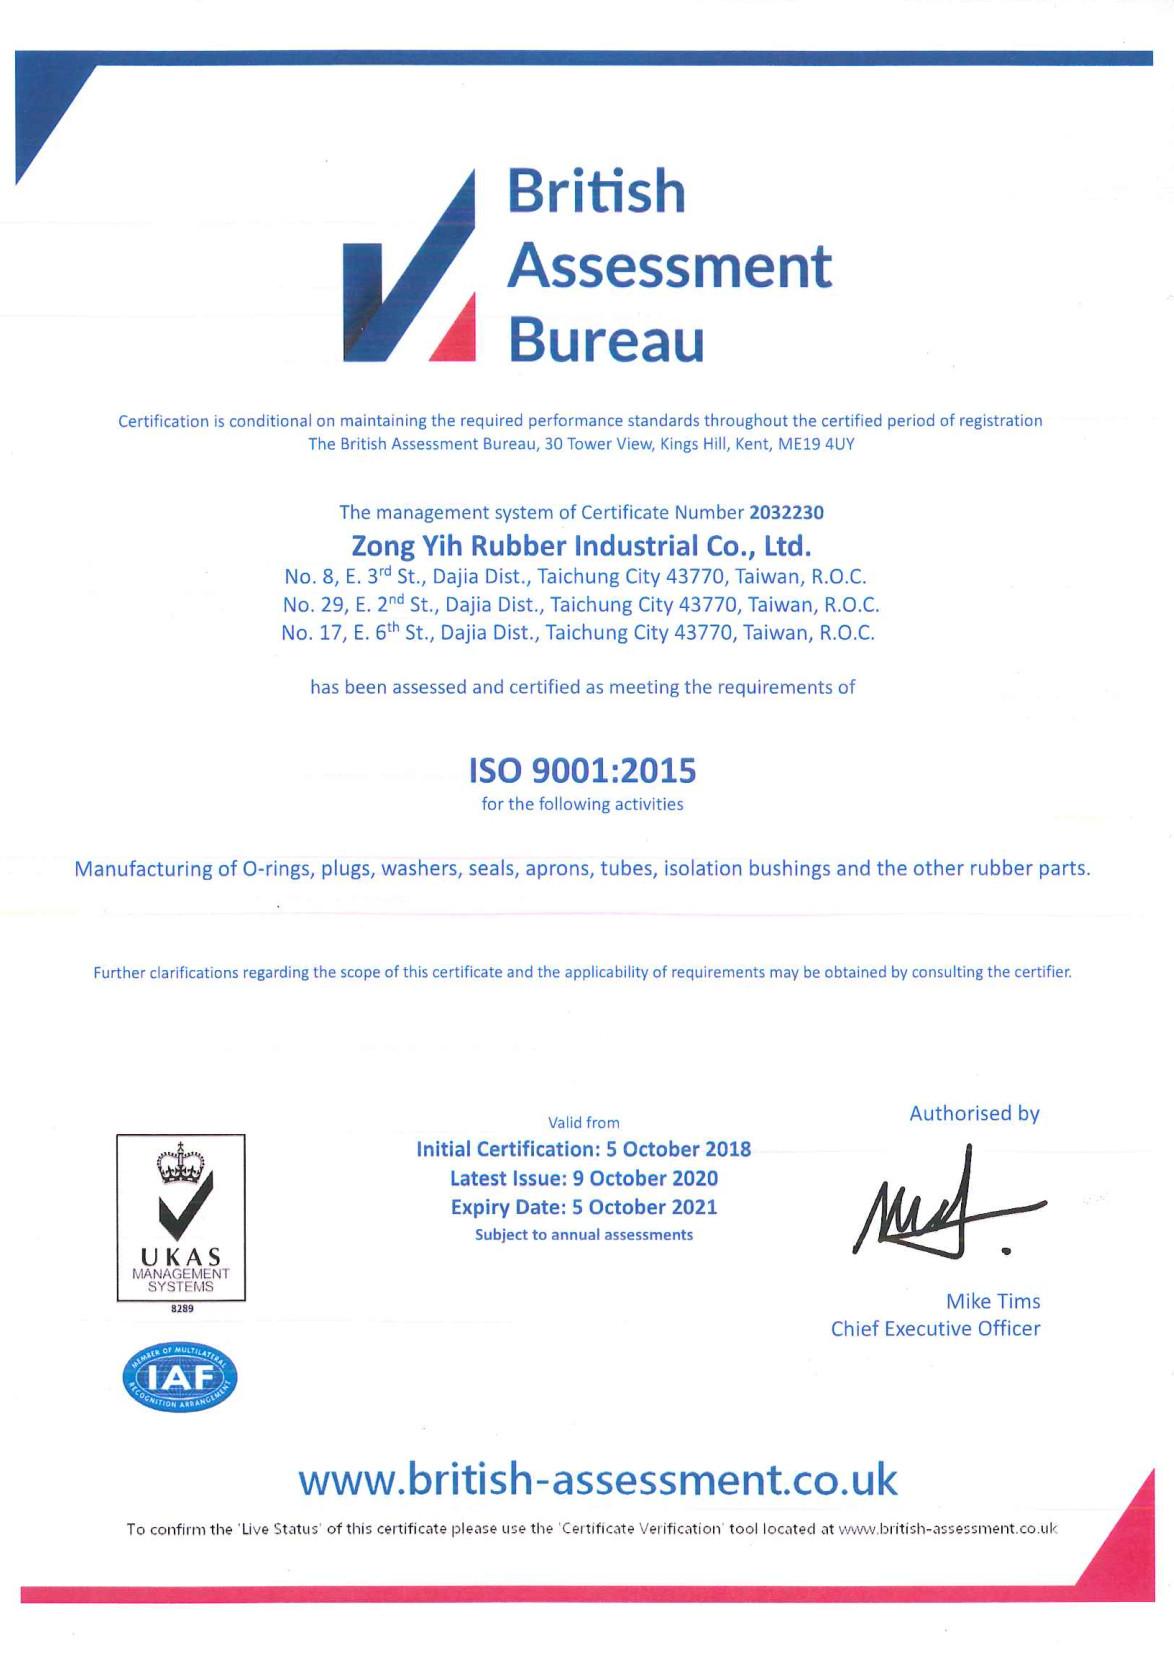 British Assessment Bureau Rubber Parts Certificate